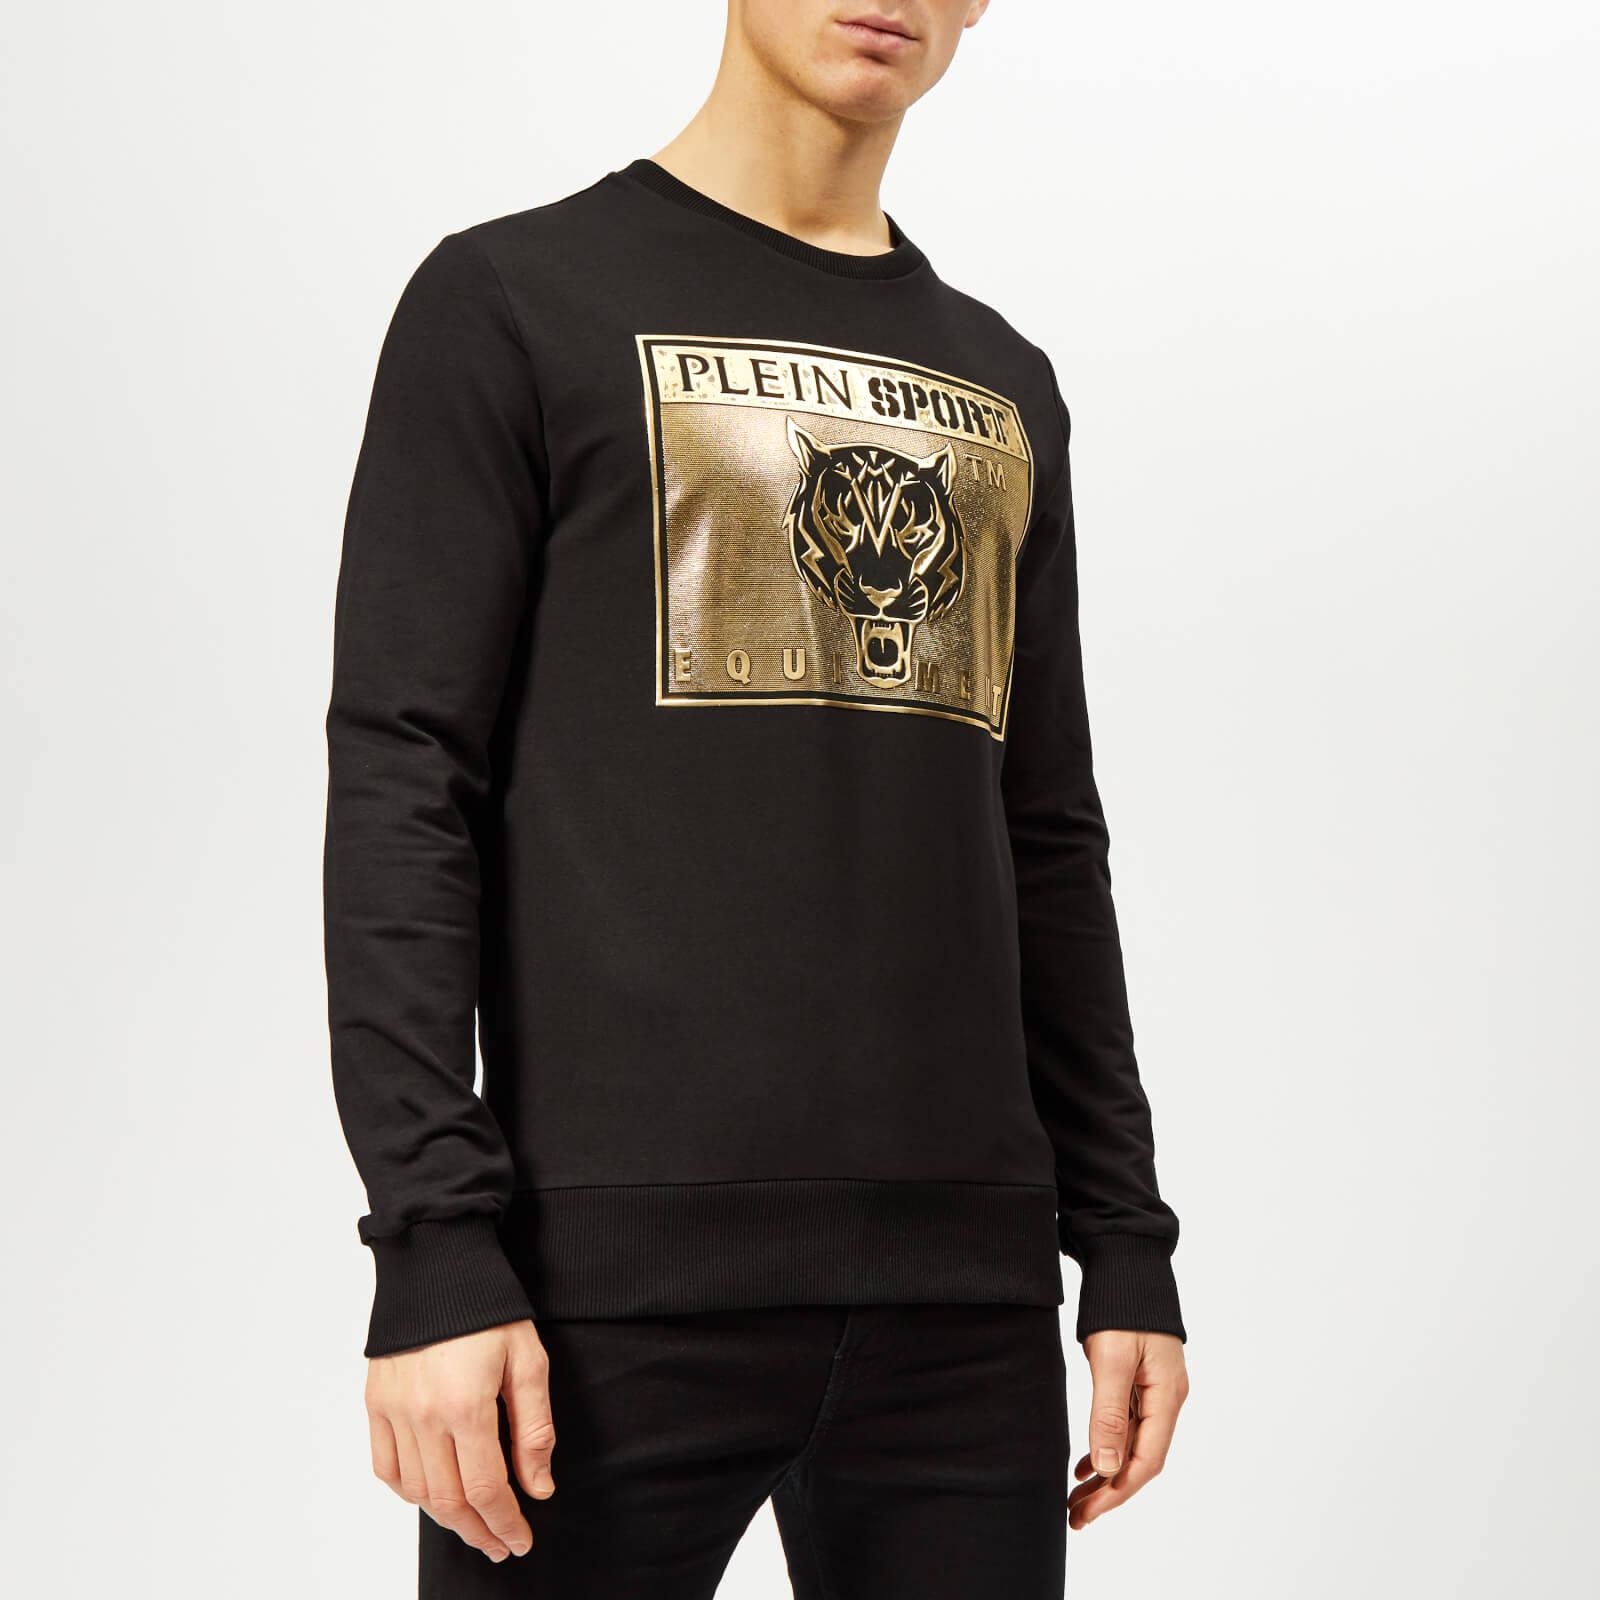 Plein Sport Men's Metal Sport Sweatshirt - Black/Gold - L - Black/Gold